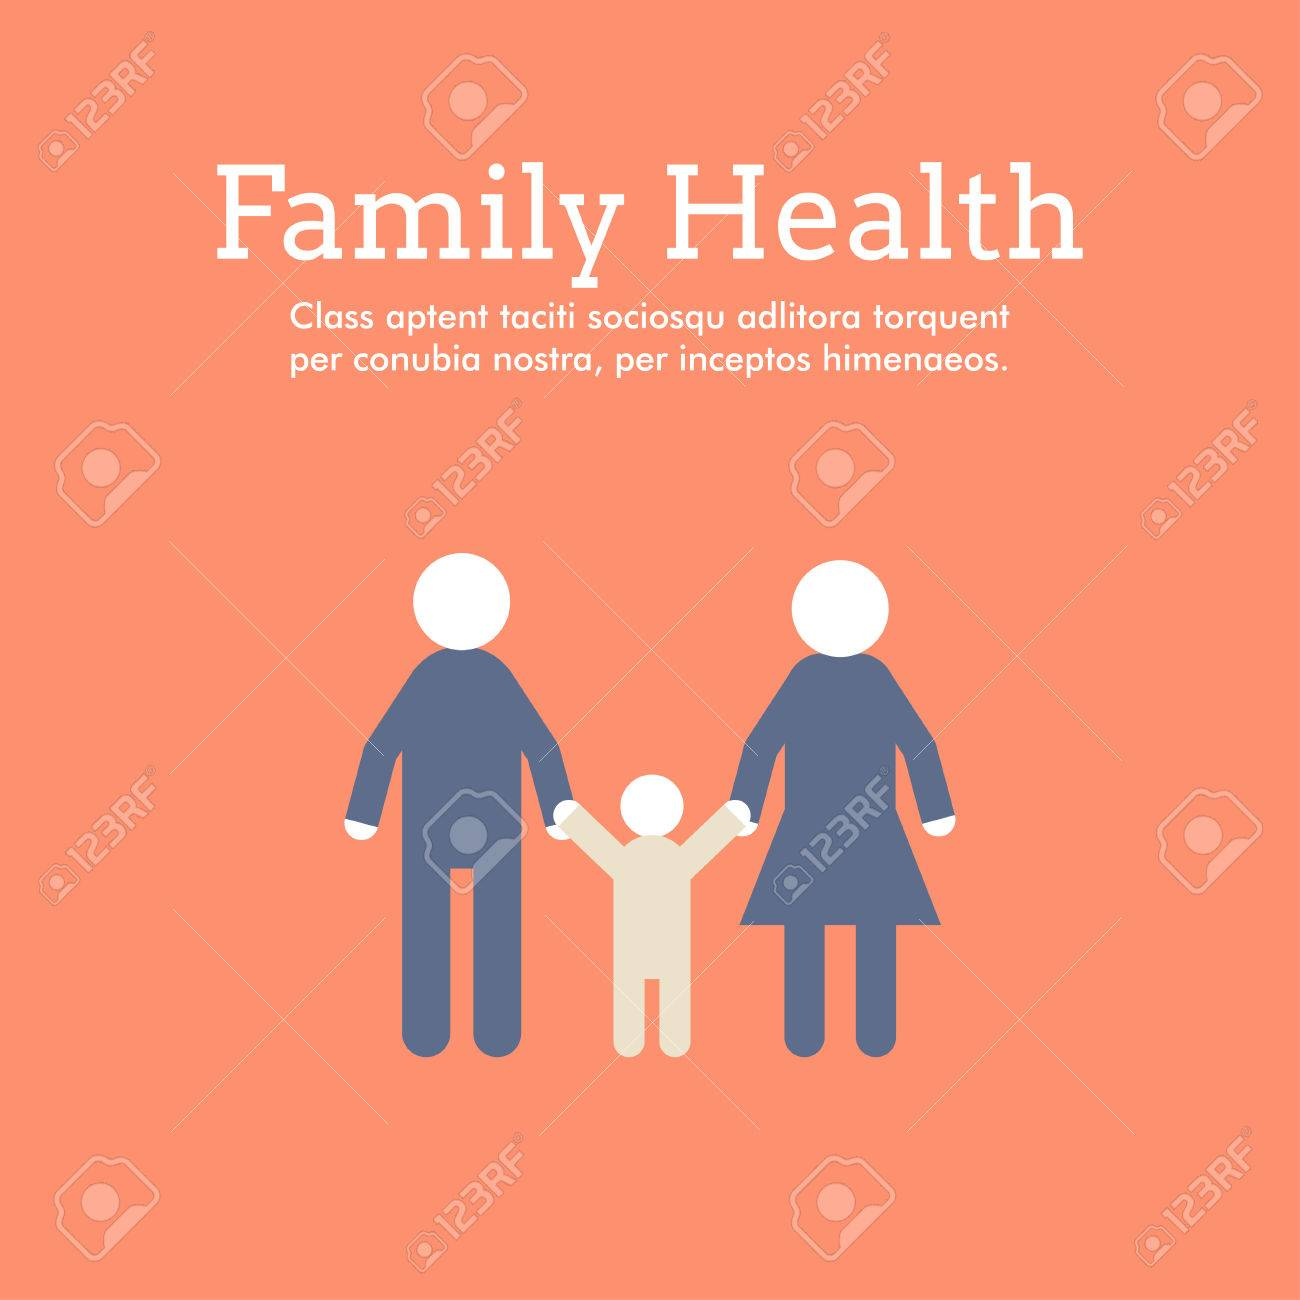 Poster design health - World Health Day Celebrating Card Or Poster Design Family Health Flat Design Stock Vector